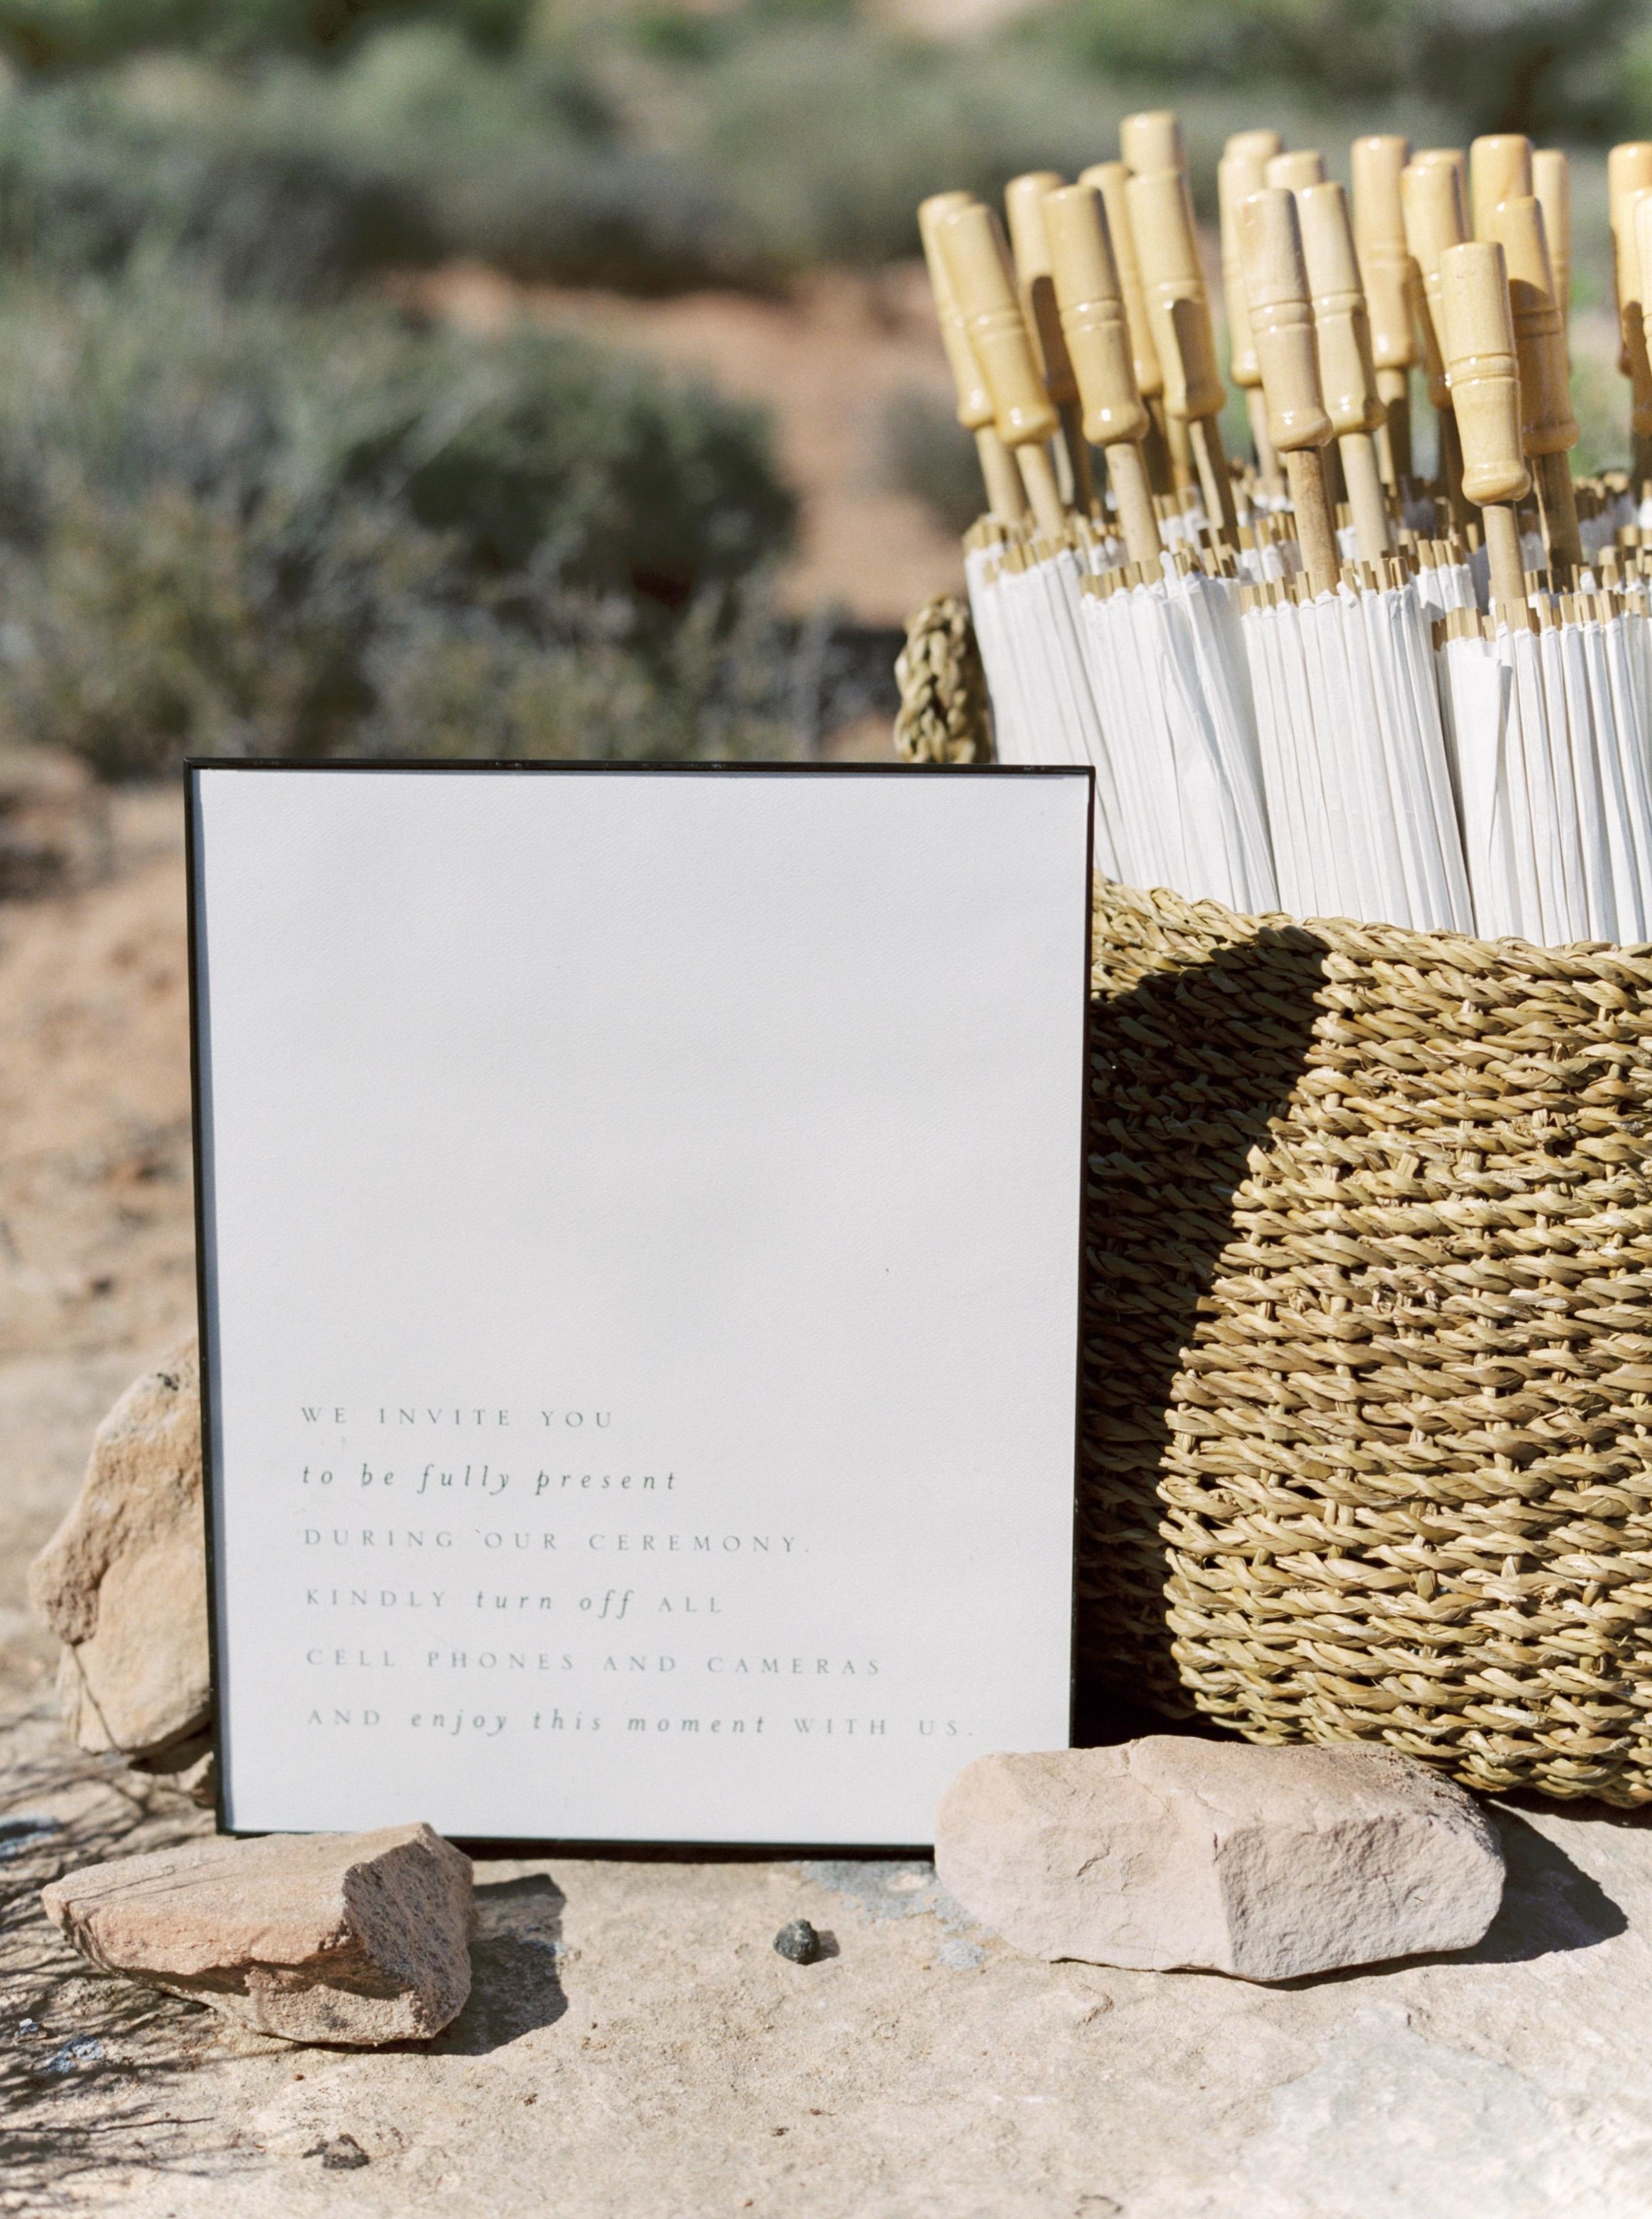 jeanette david wedding unplugged ceremony sign